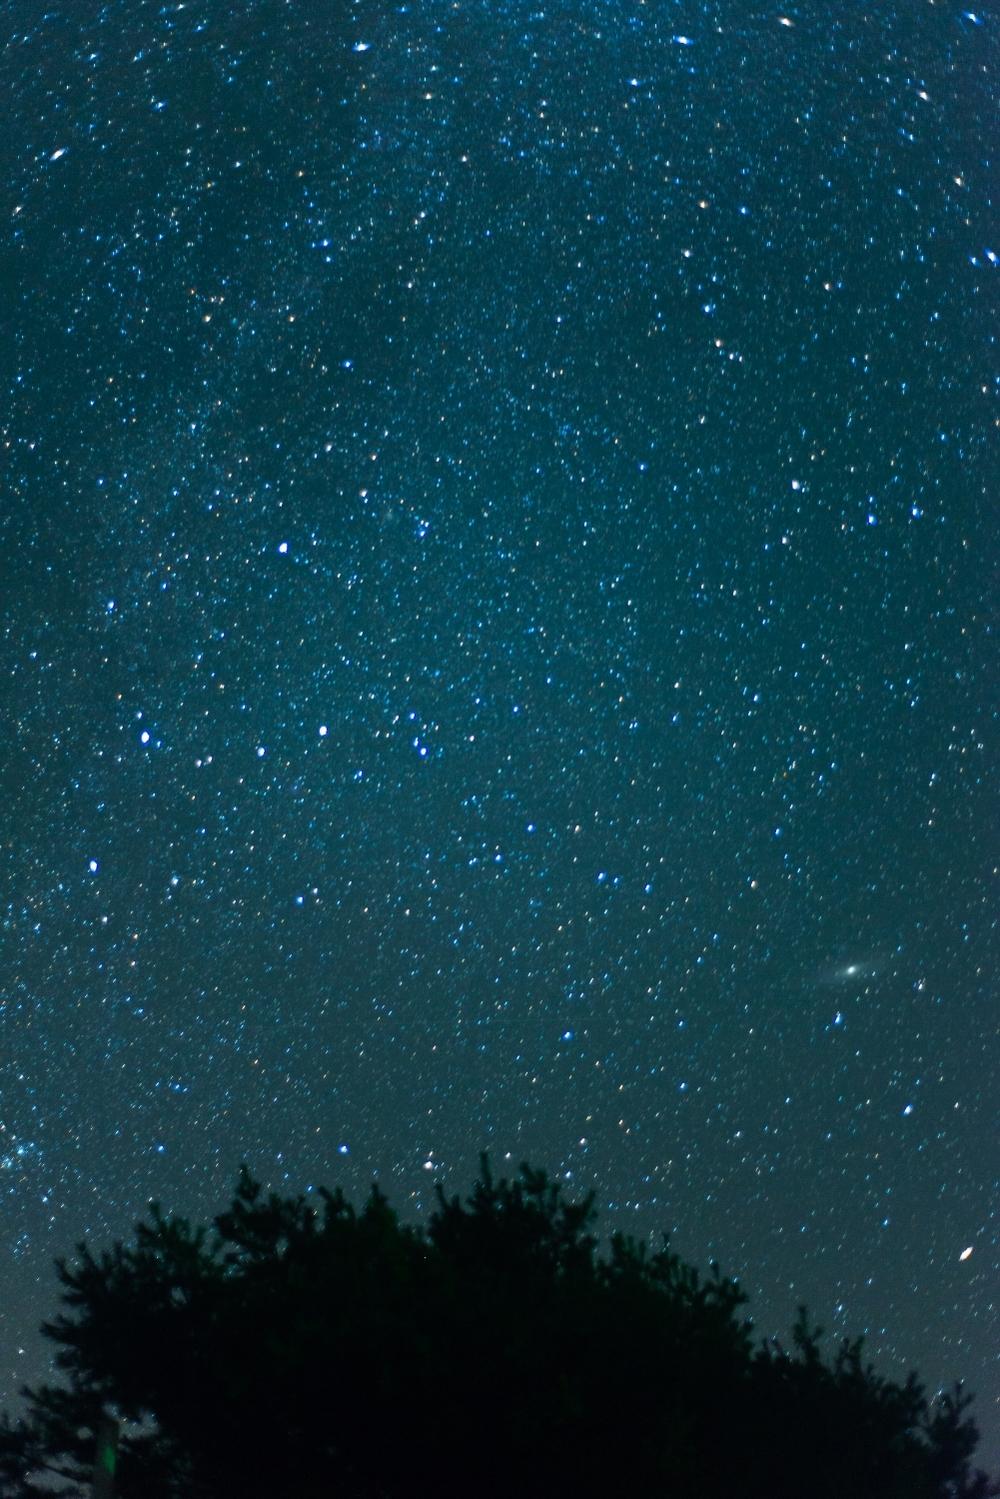 travel-photography-maine-night-stars-astro-landscape-photography-long-exposure-long-island-ny-photographer-natural-light-digital-55.jpg